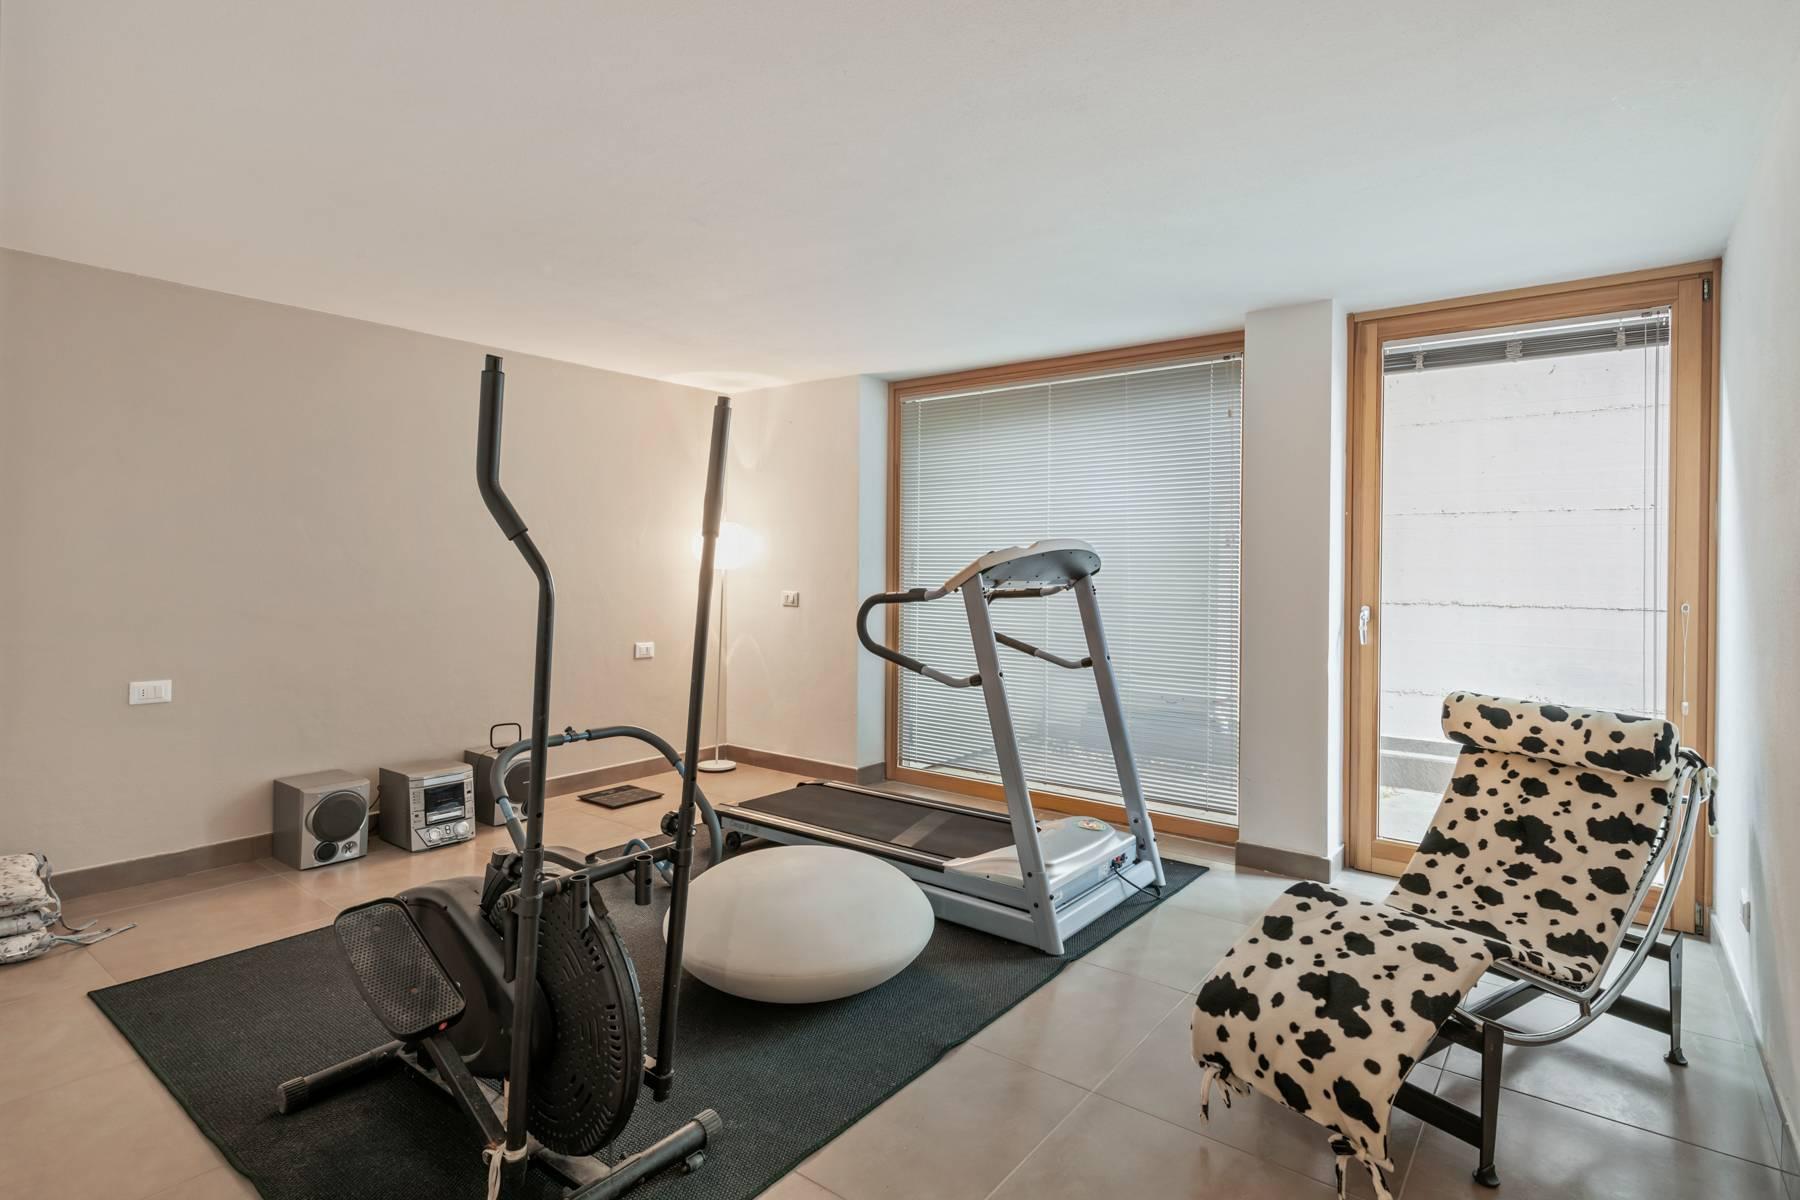 Appartamento in Vendita a Pontassieve: 5 locali, 300 mq - Foto 15